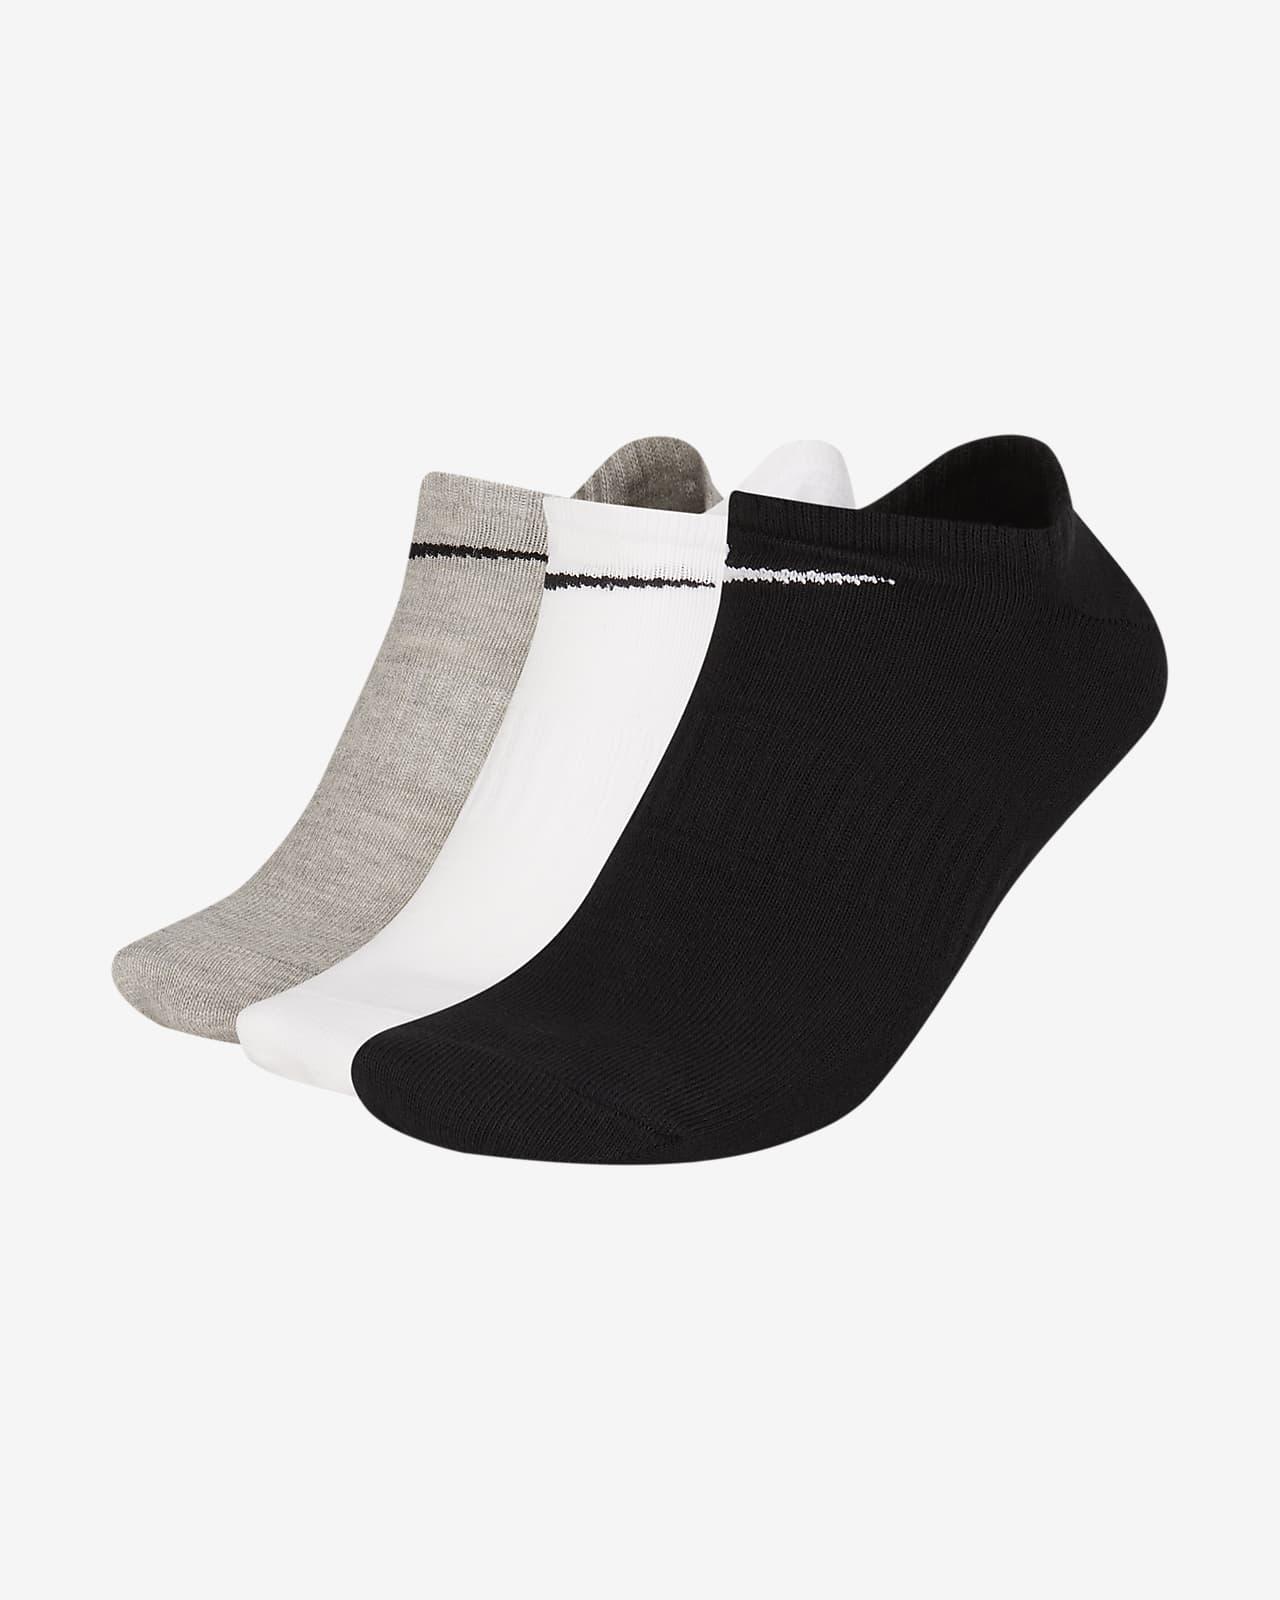 Nike Everyday Lightweight Training No-Show Socks (3 Pairs)